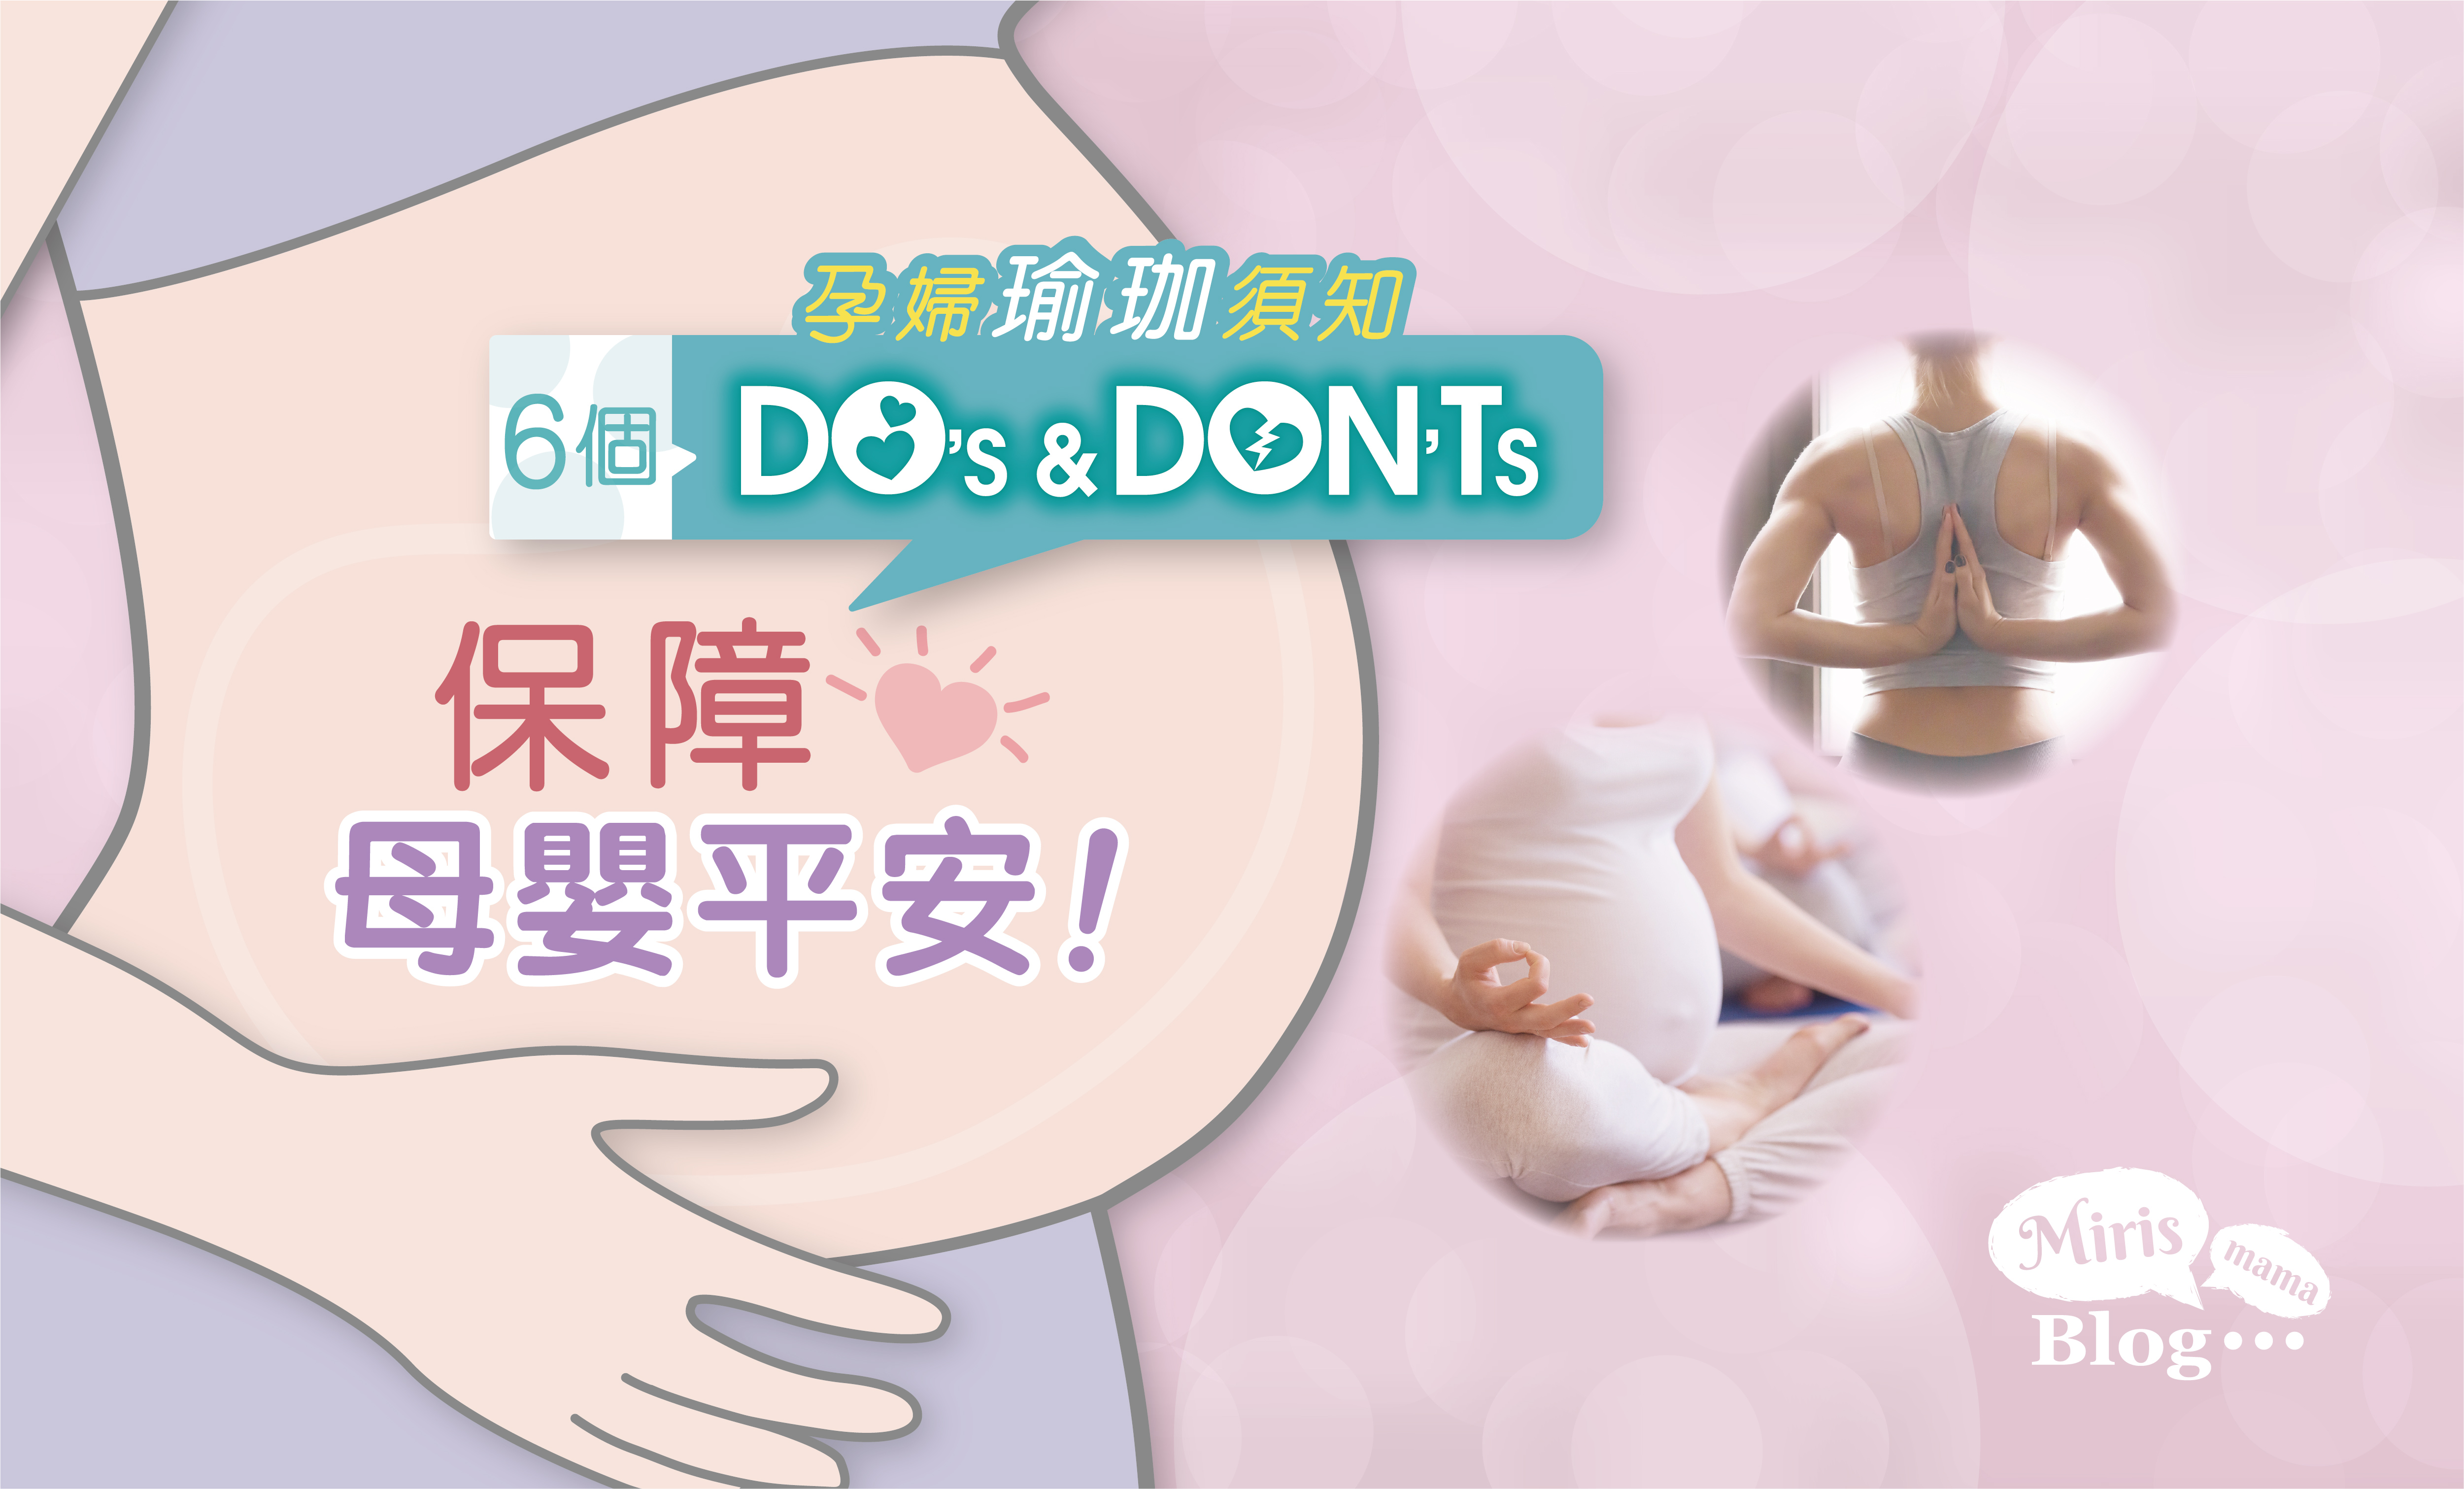 【孕婦瑜珈須知】6個Do's & Don'ts保障母嬰平安!